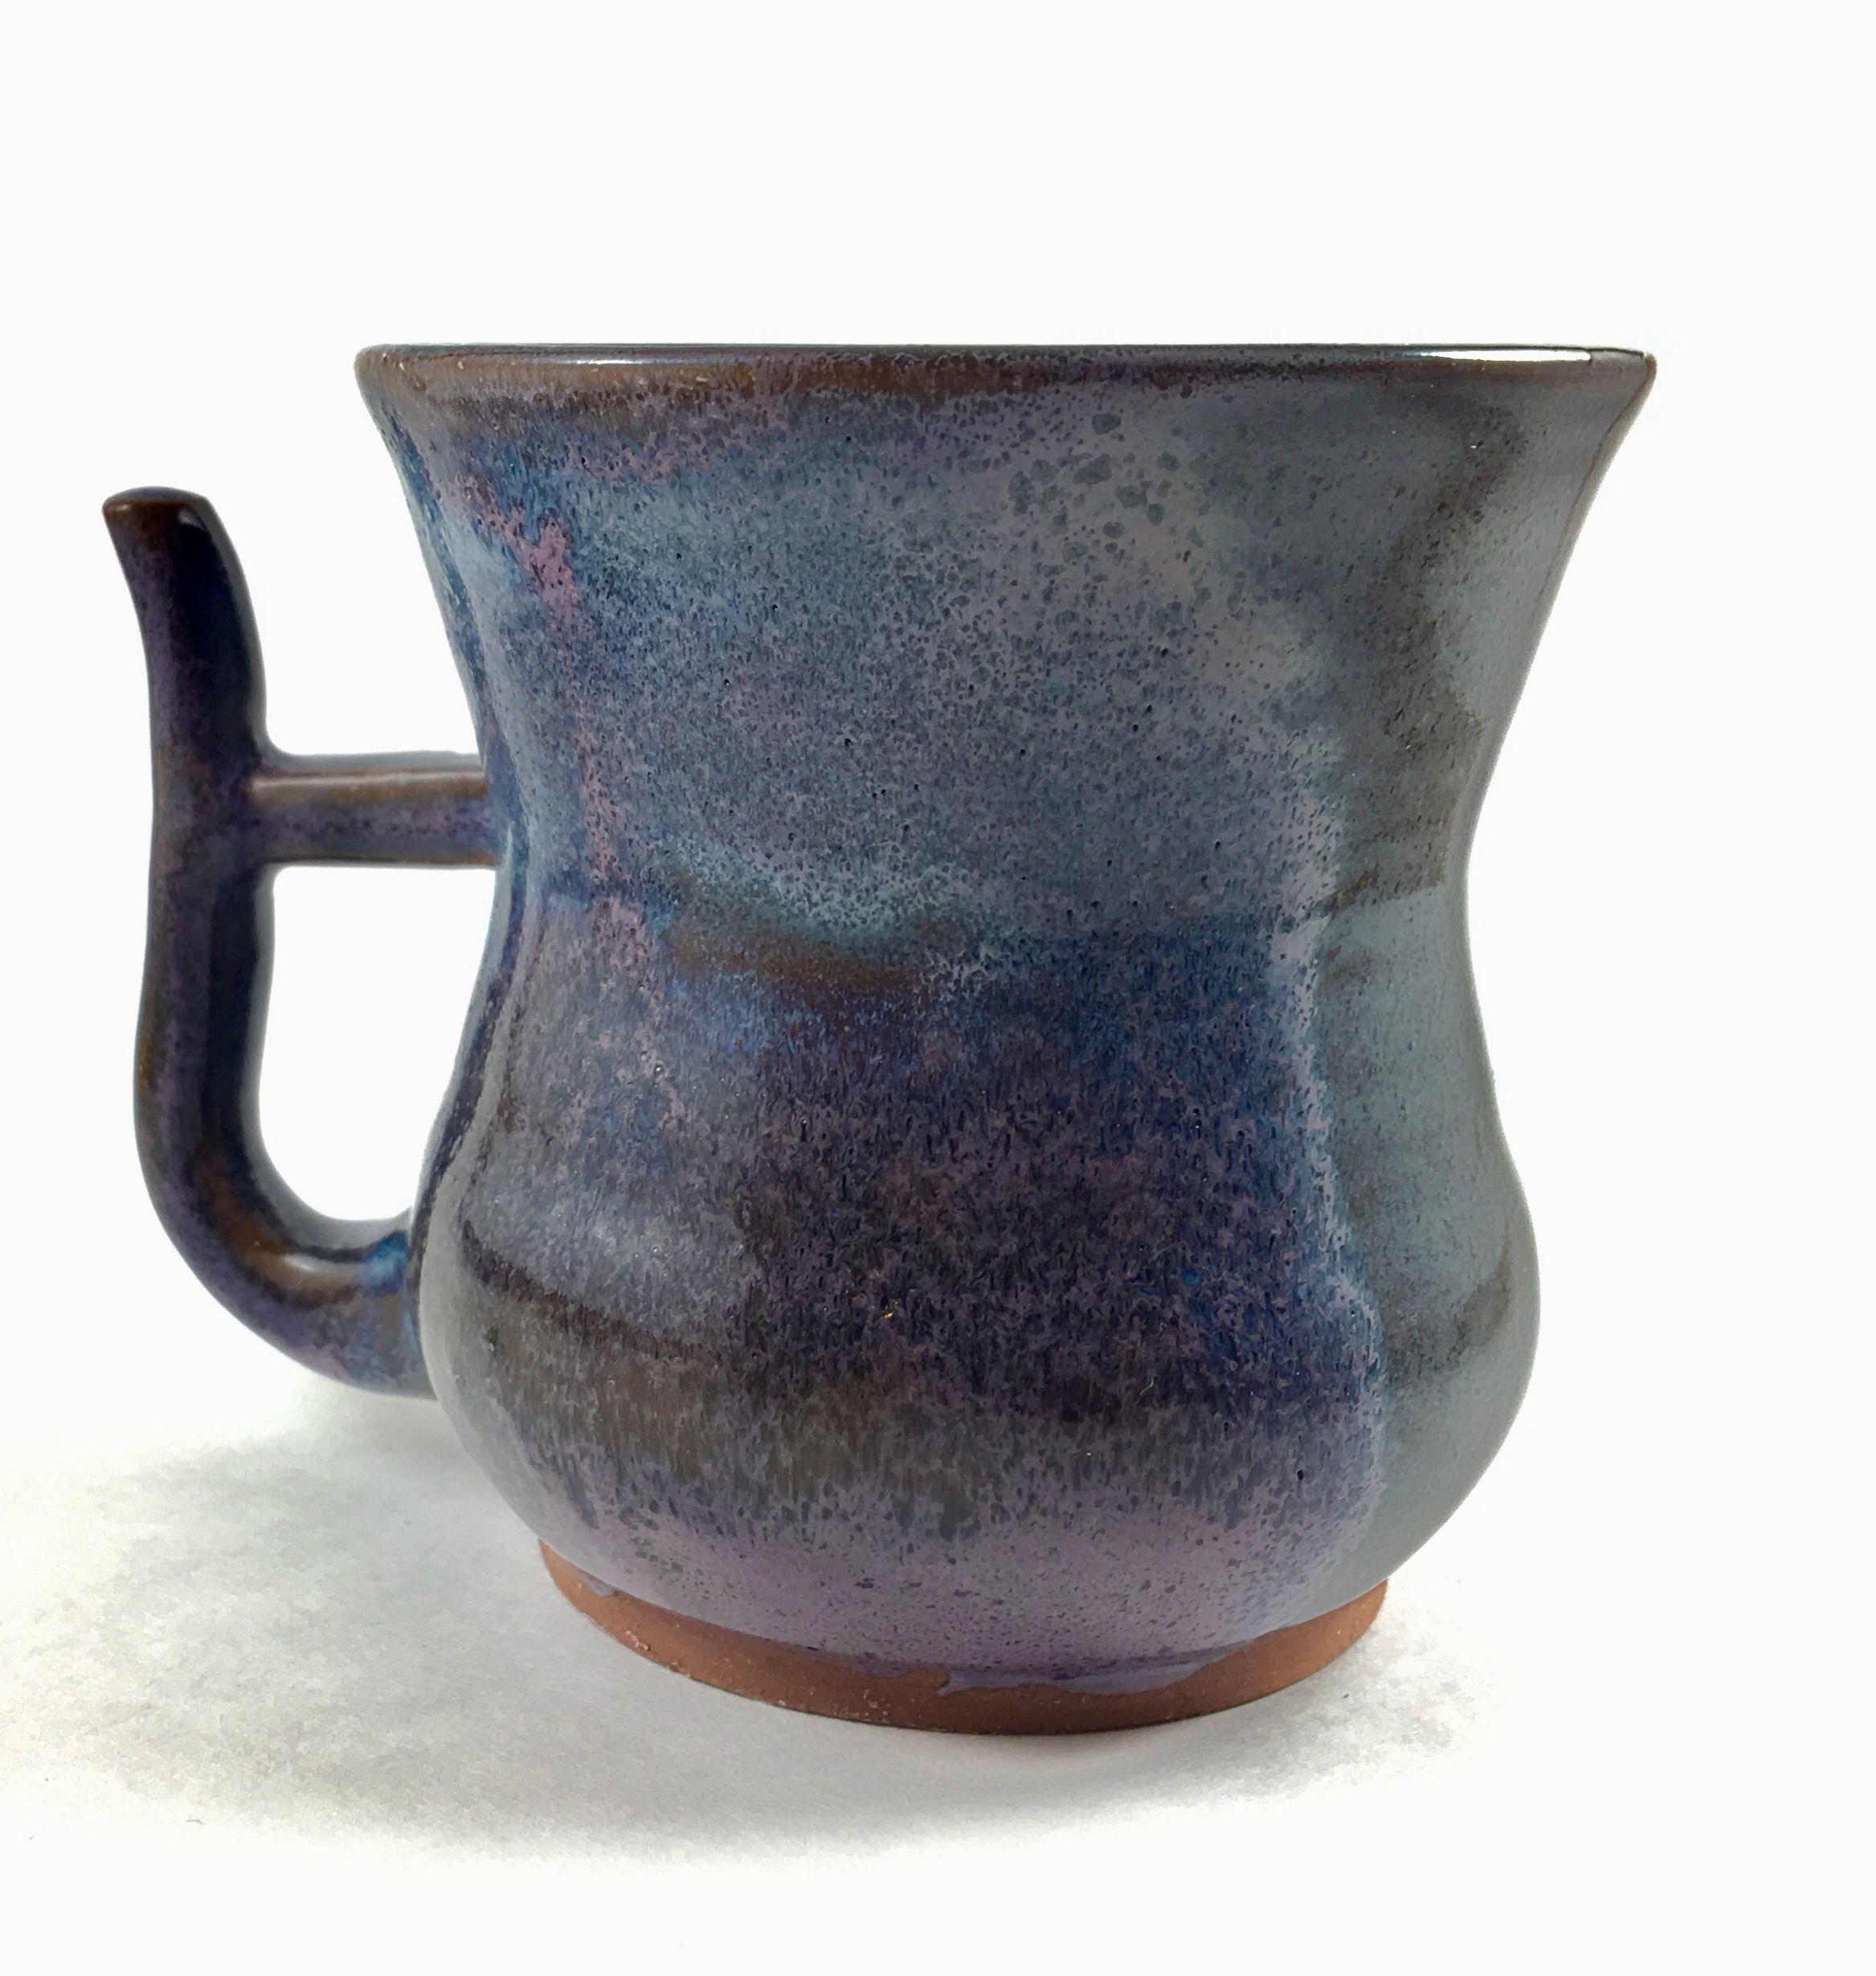 Coffee mug pastries_and_pottery Mugs, Coffee mugs, Pottery